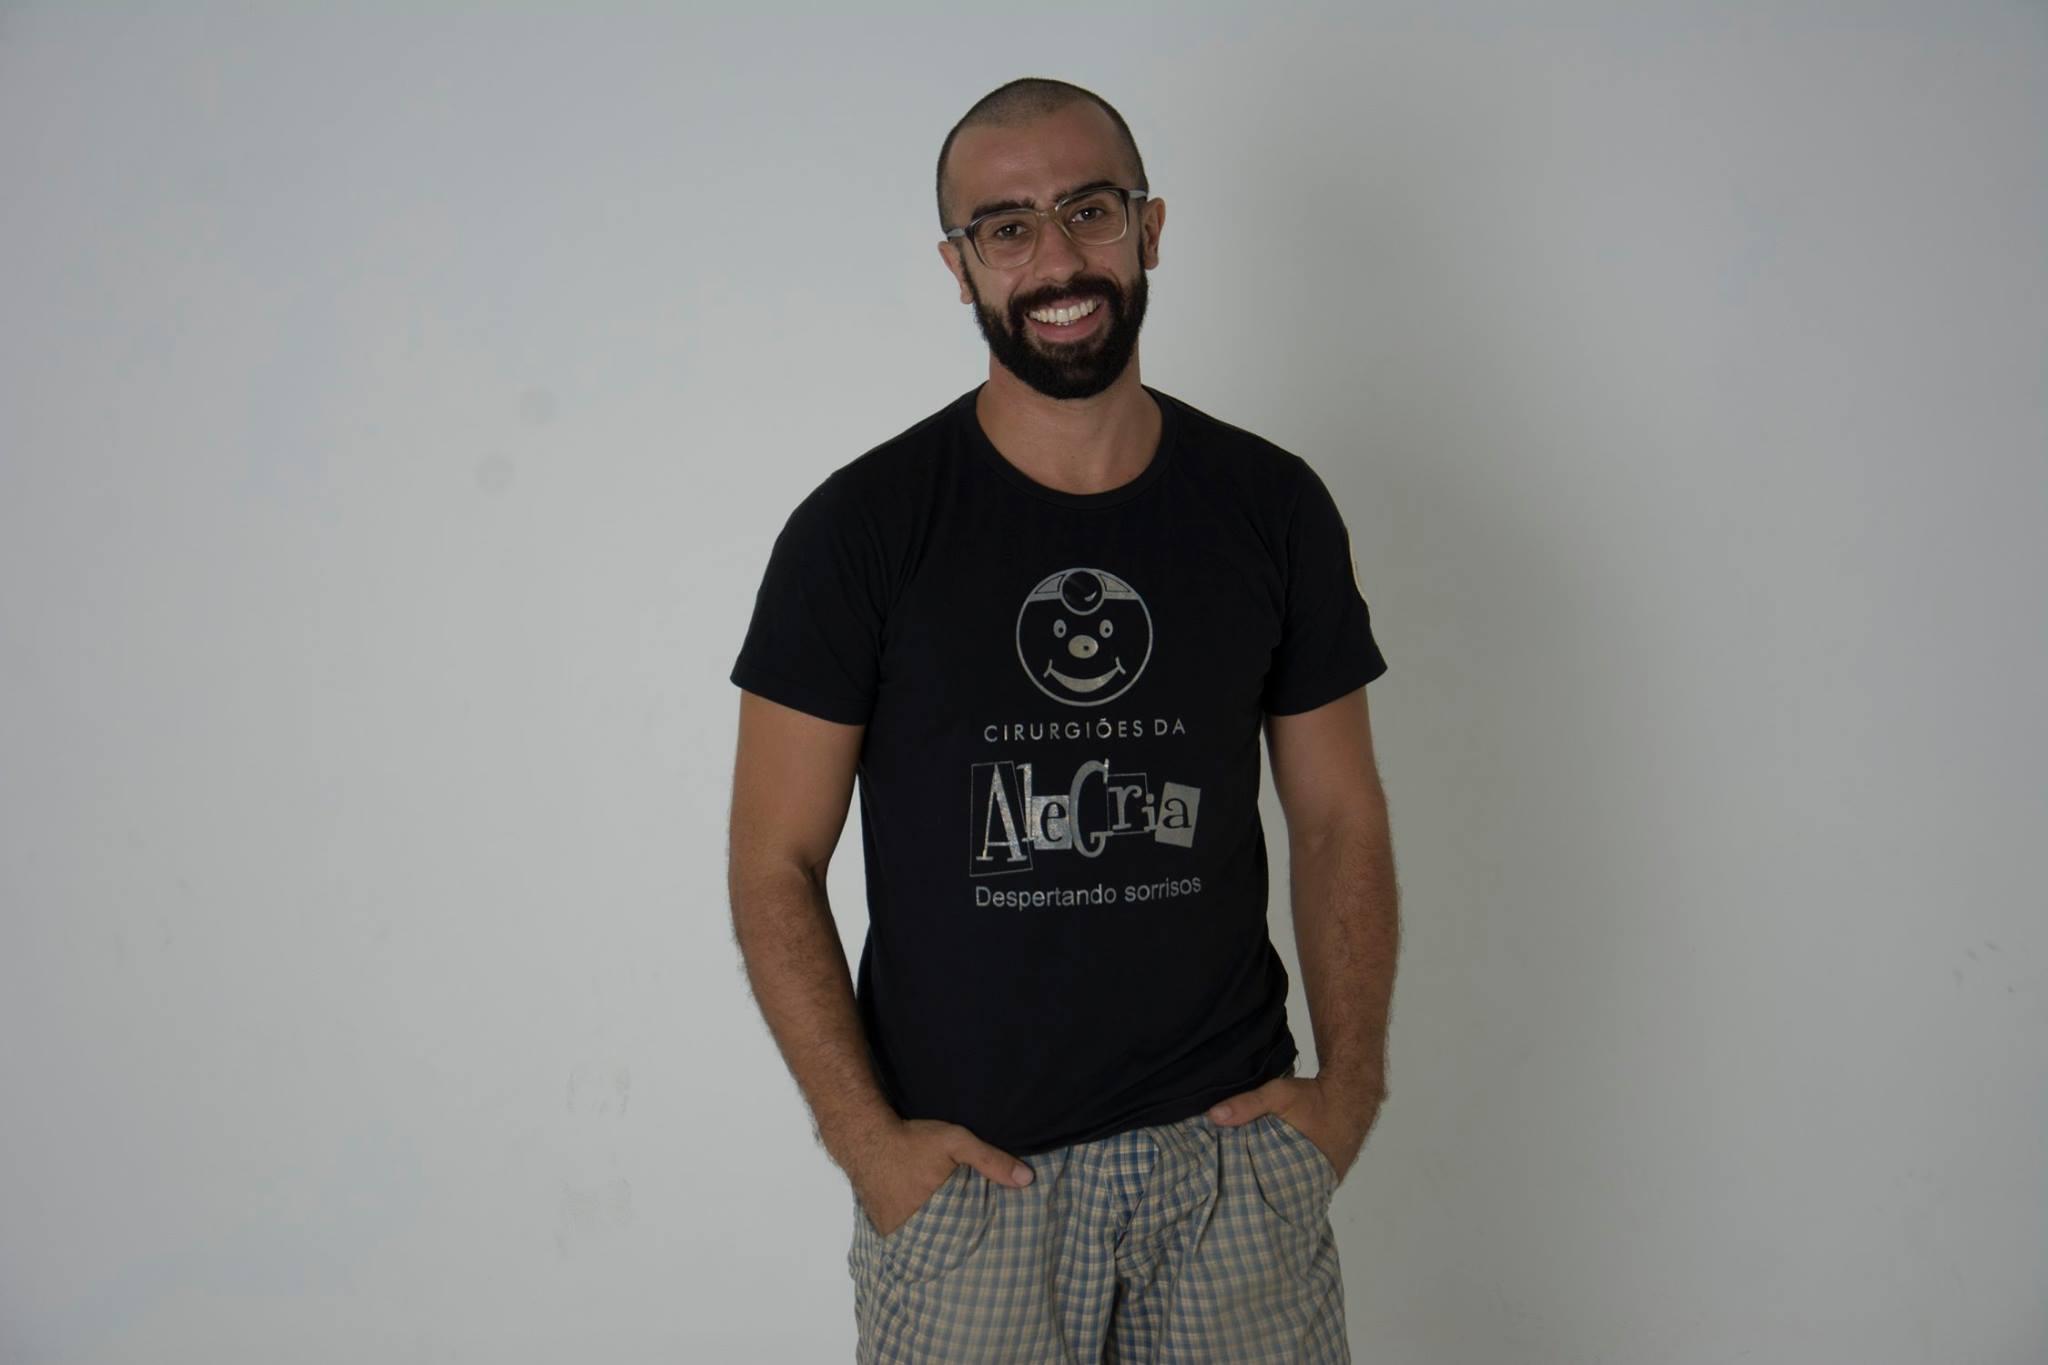 Hugo Delariva - Cirurgiões da Alegria